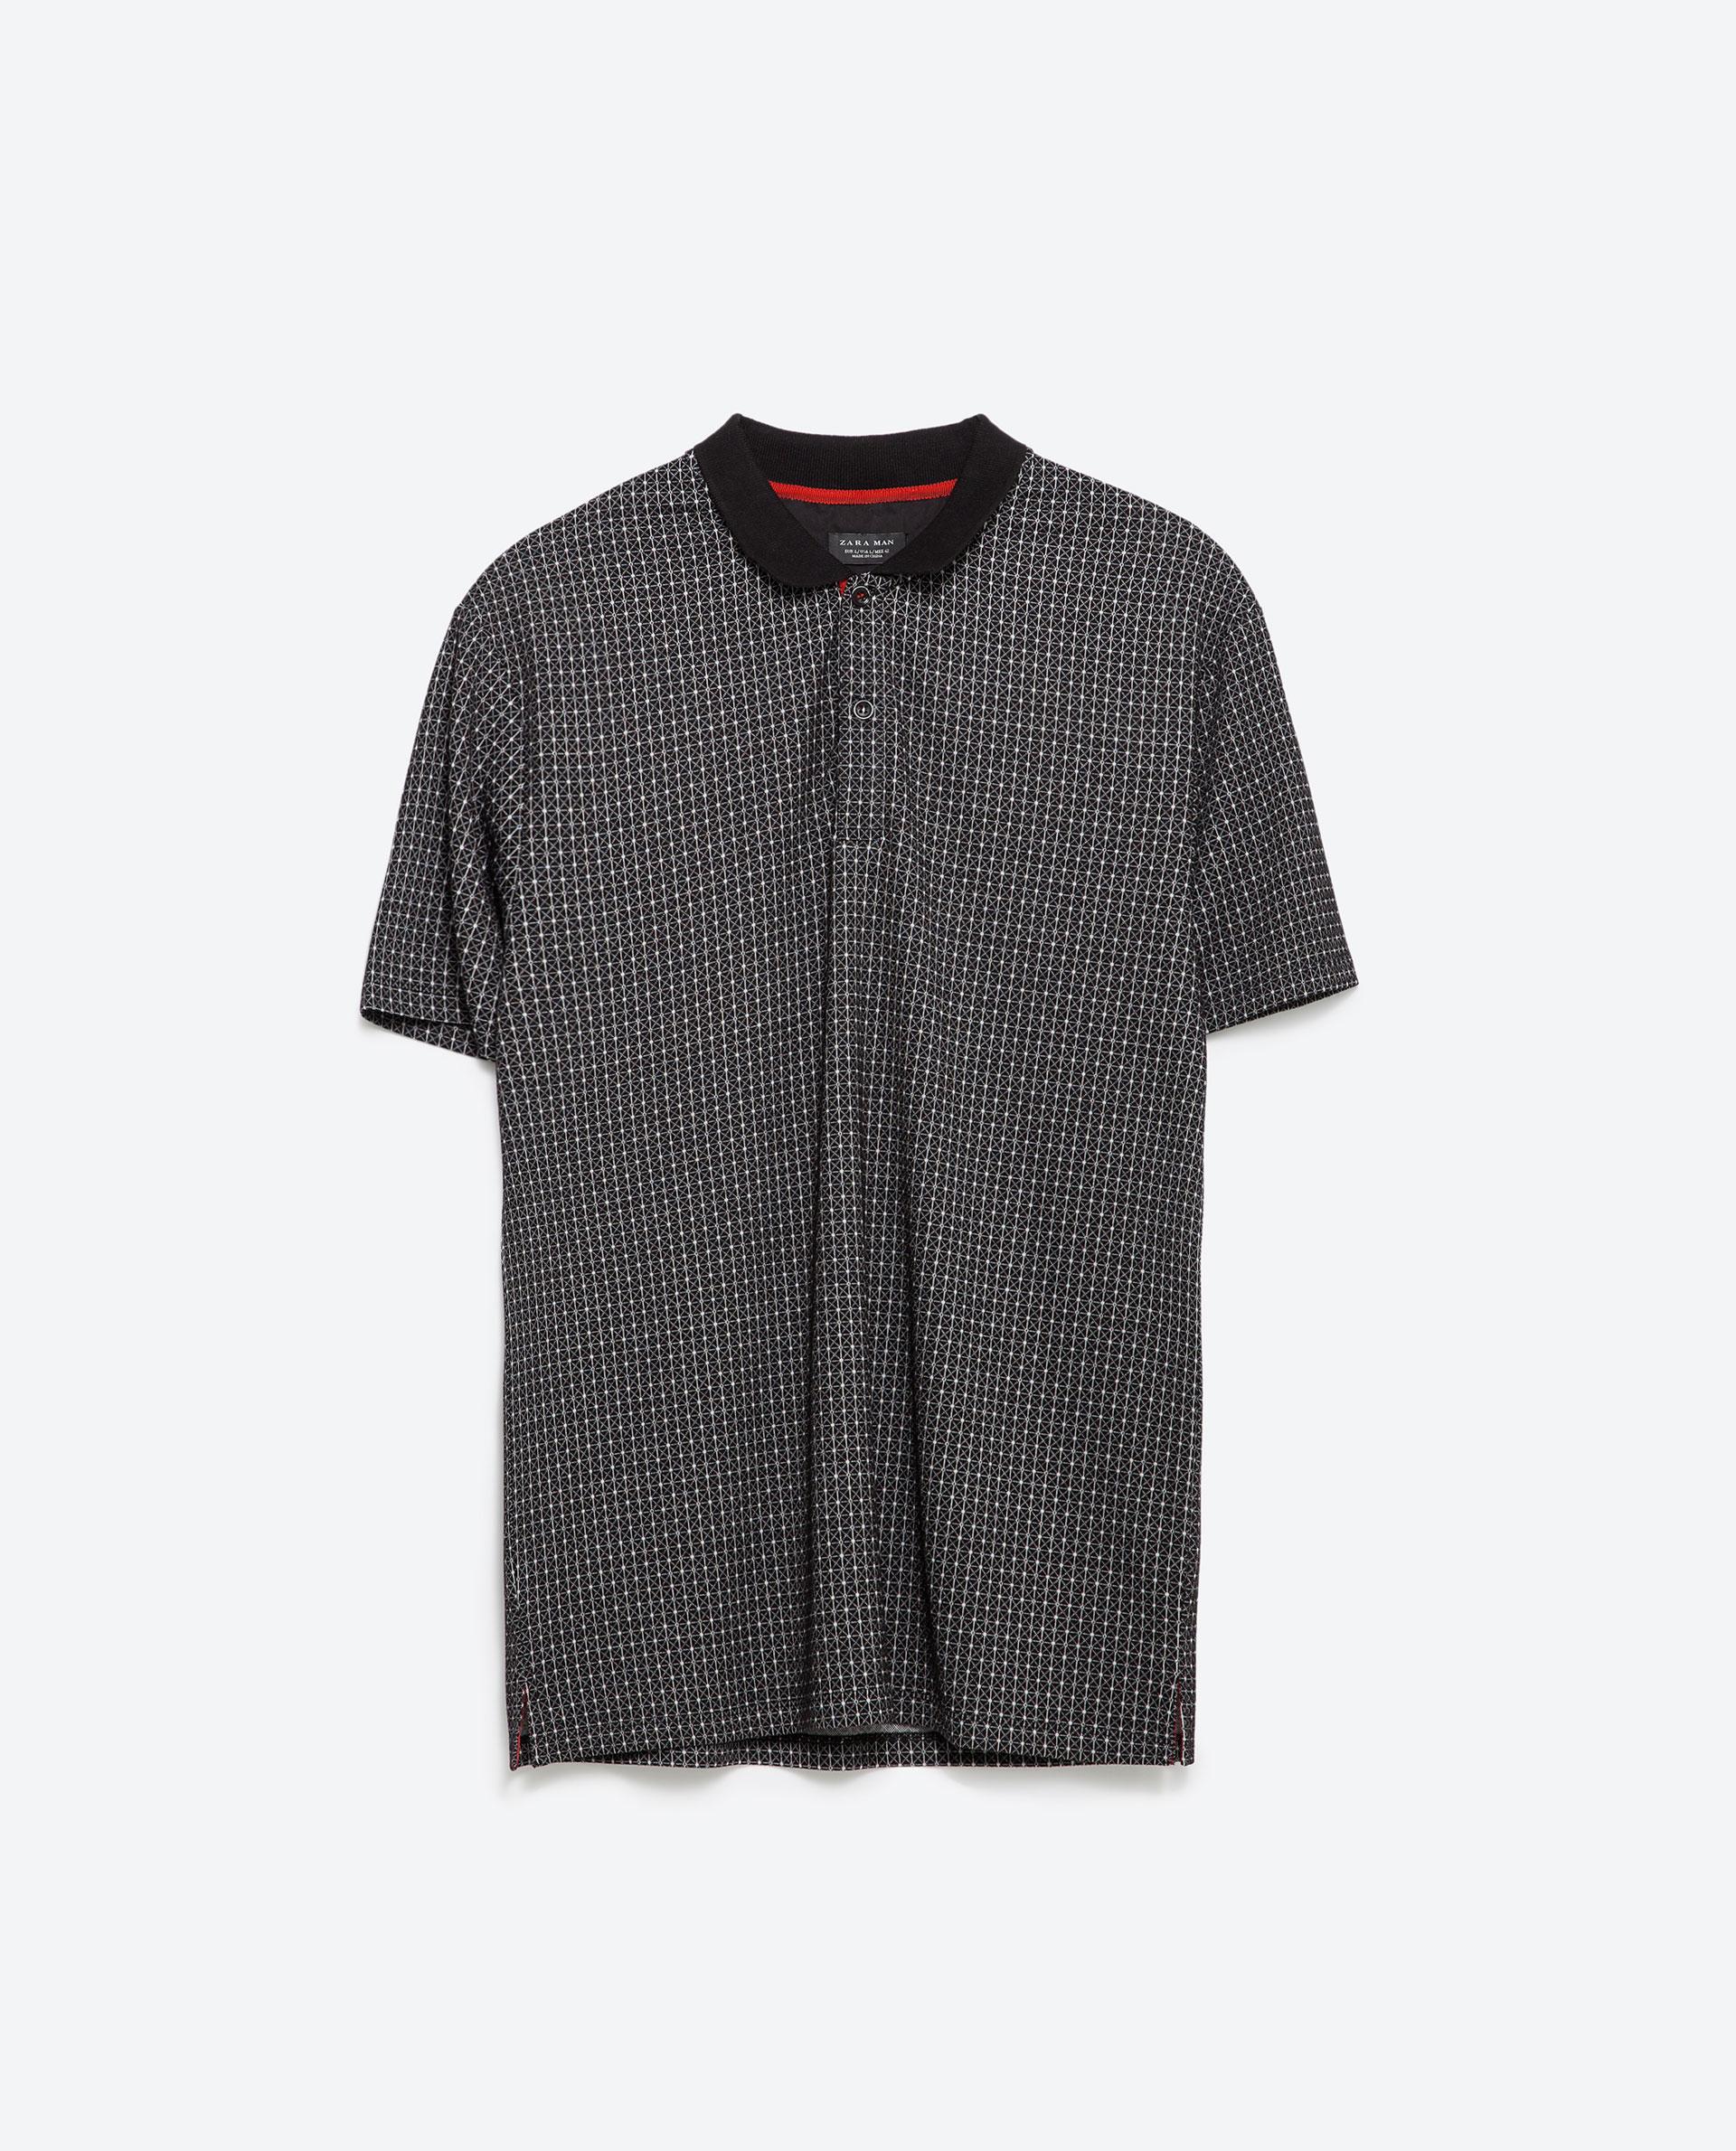 Zara jacquard polo shirt in black for men lyst for Zara mens shirts sale